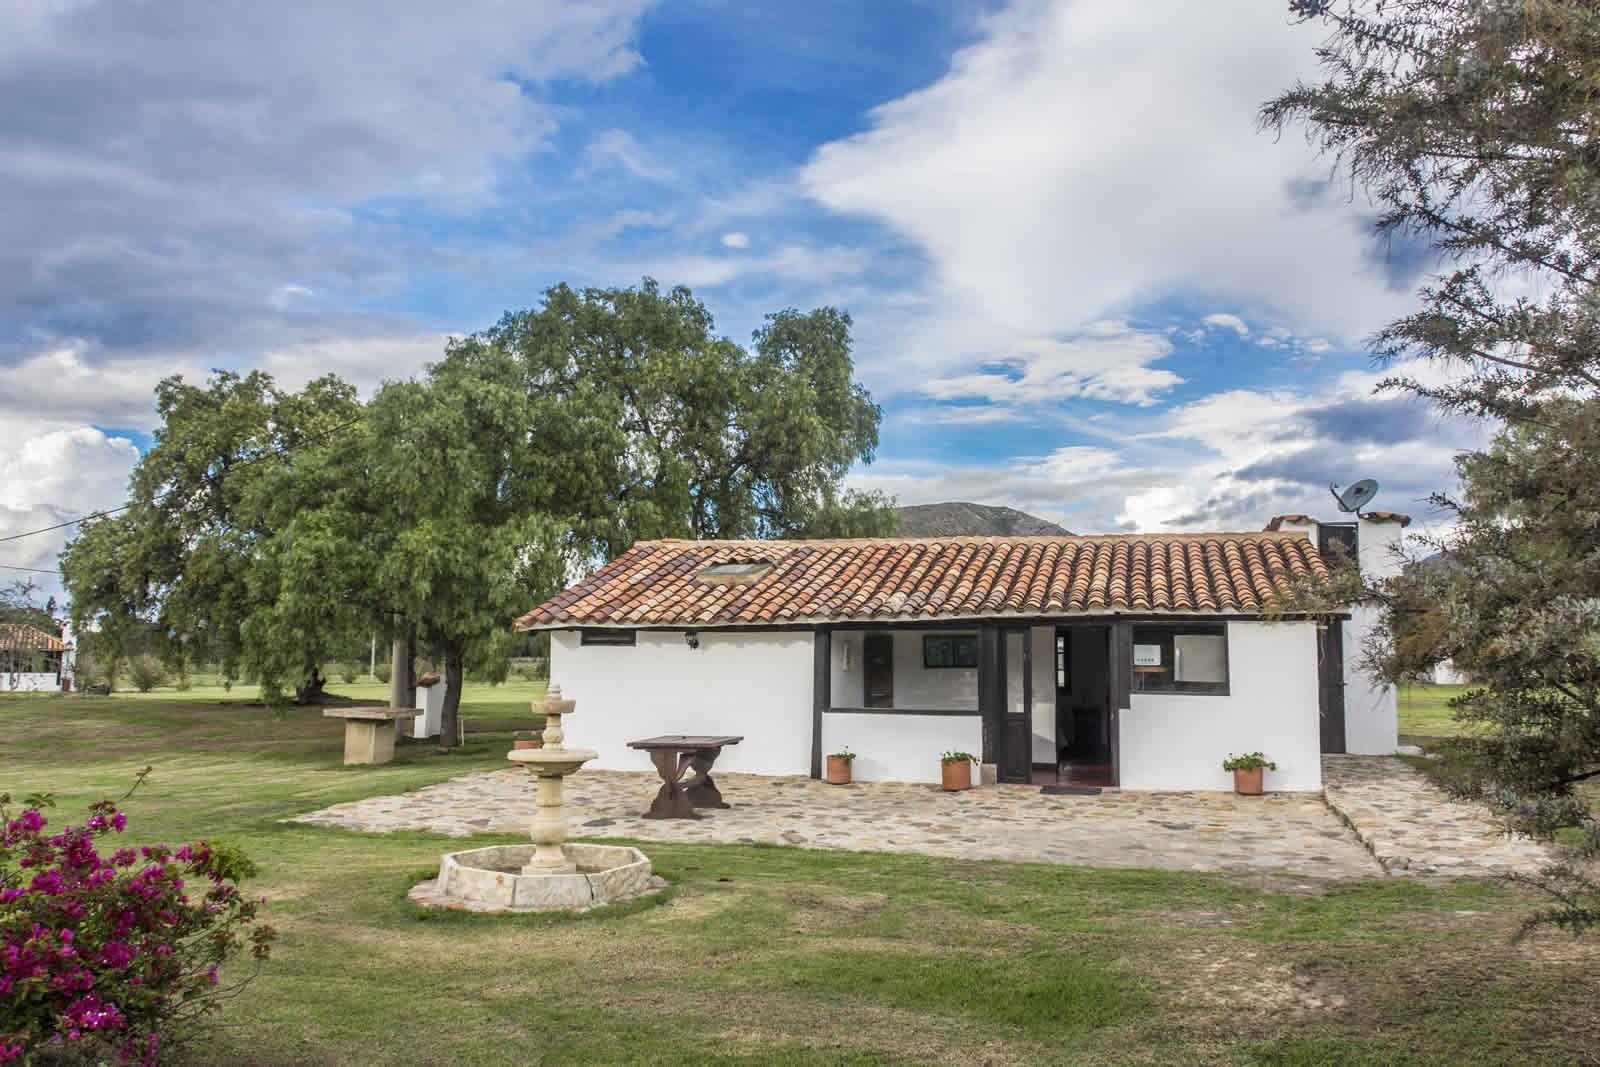 Alquiler casa de verano Villa de Leyva Fachada